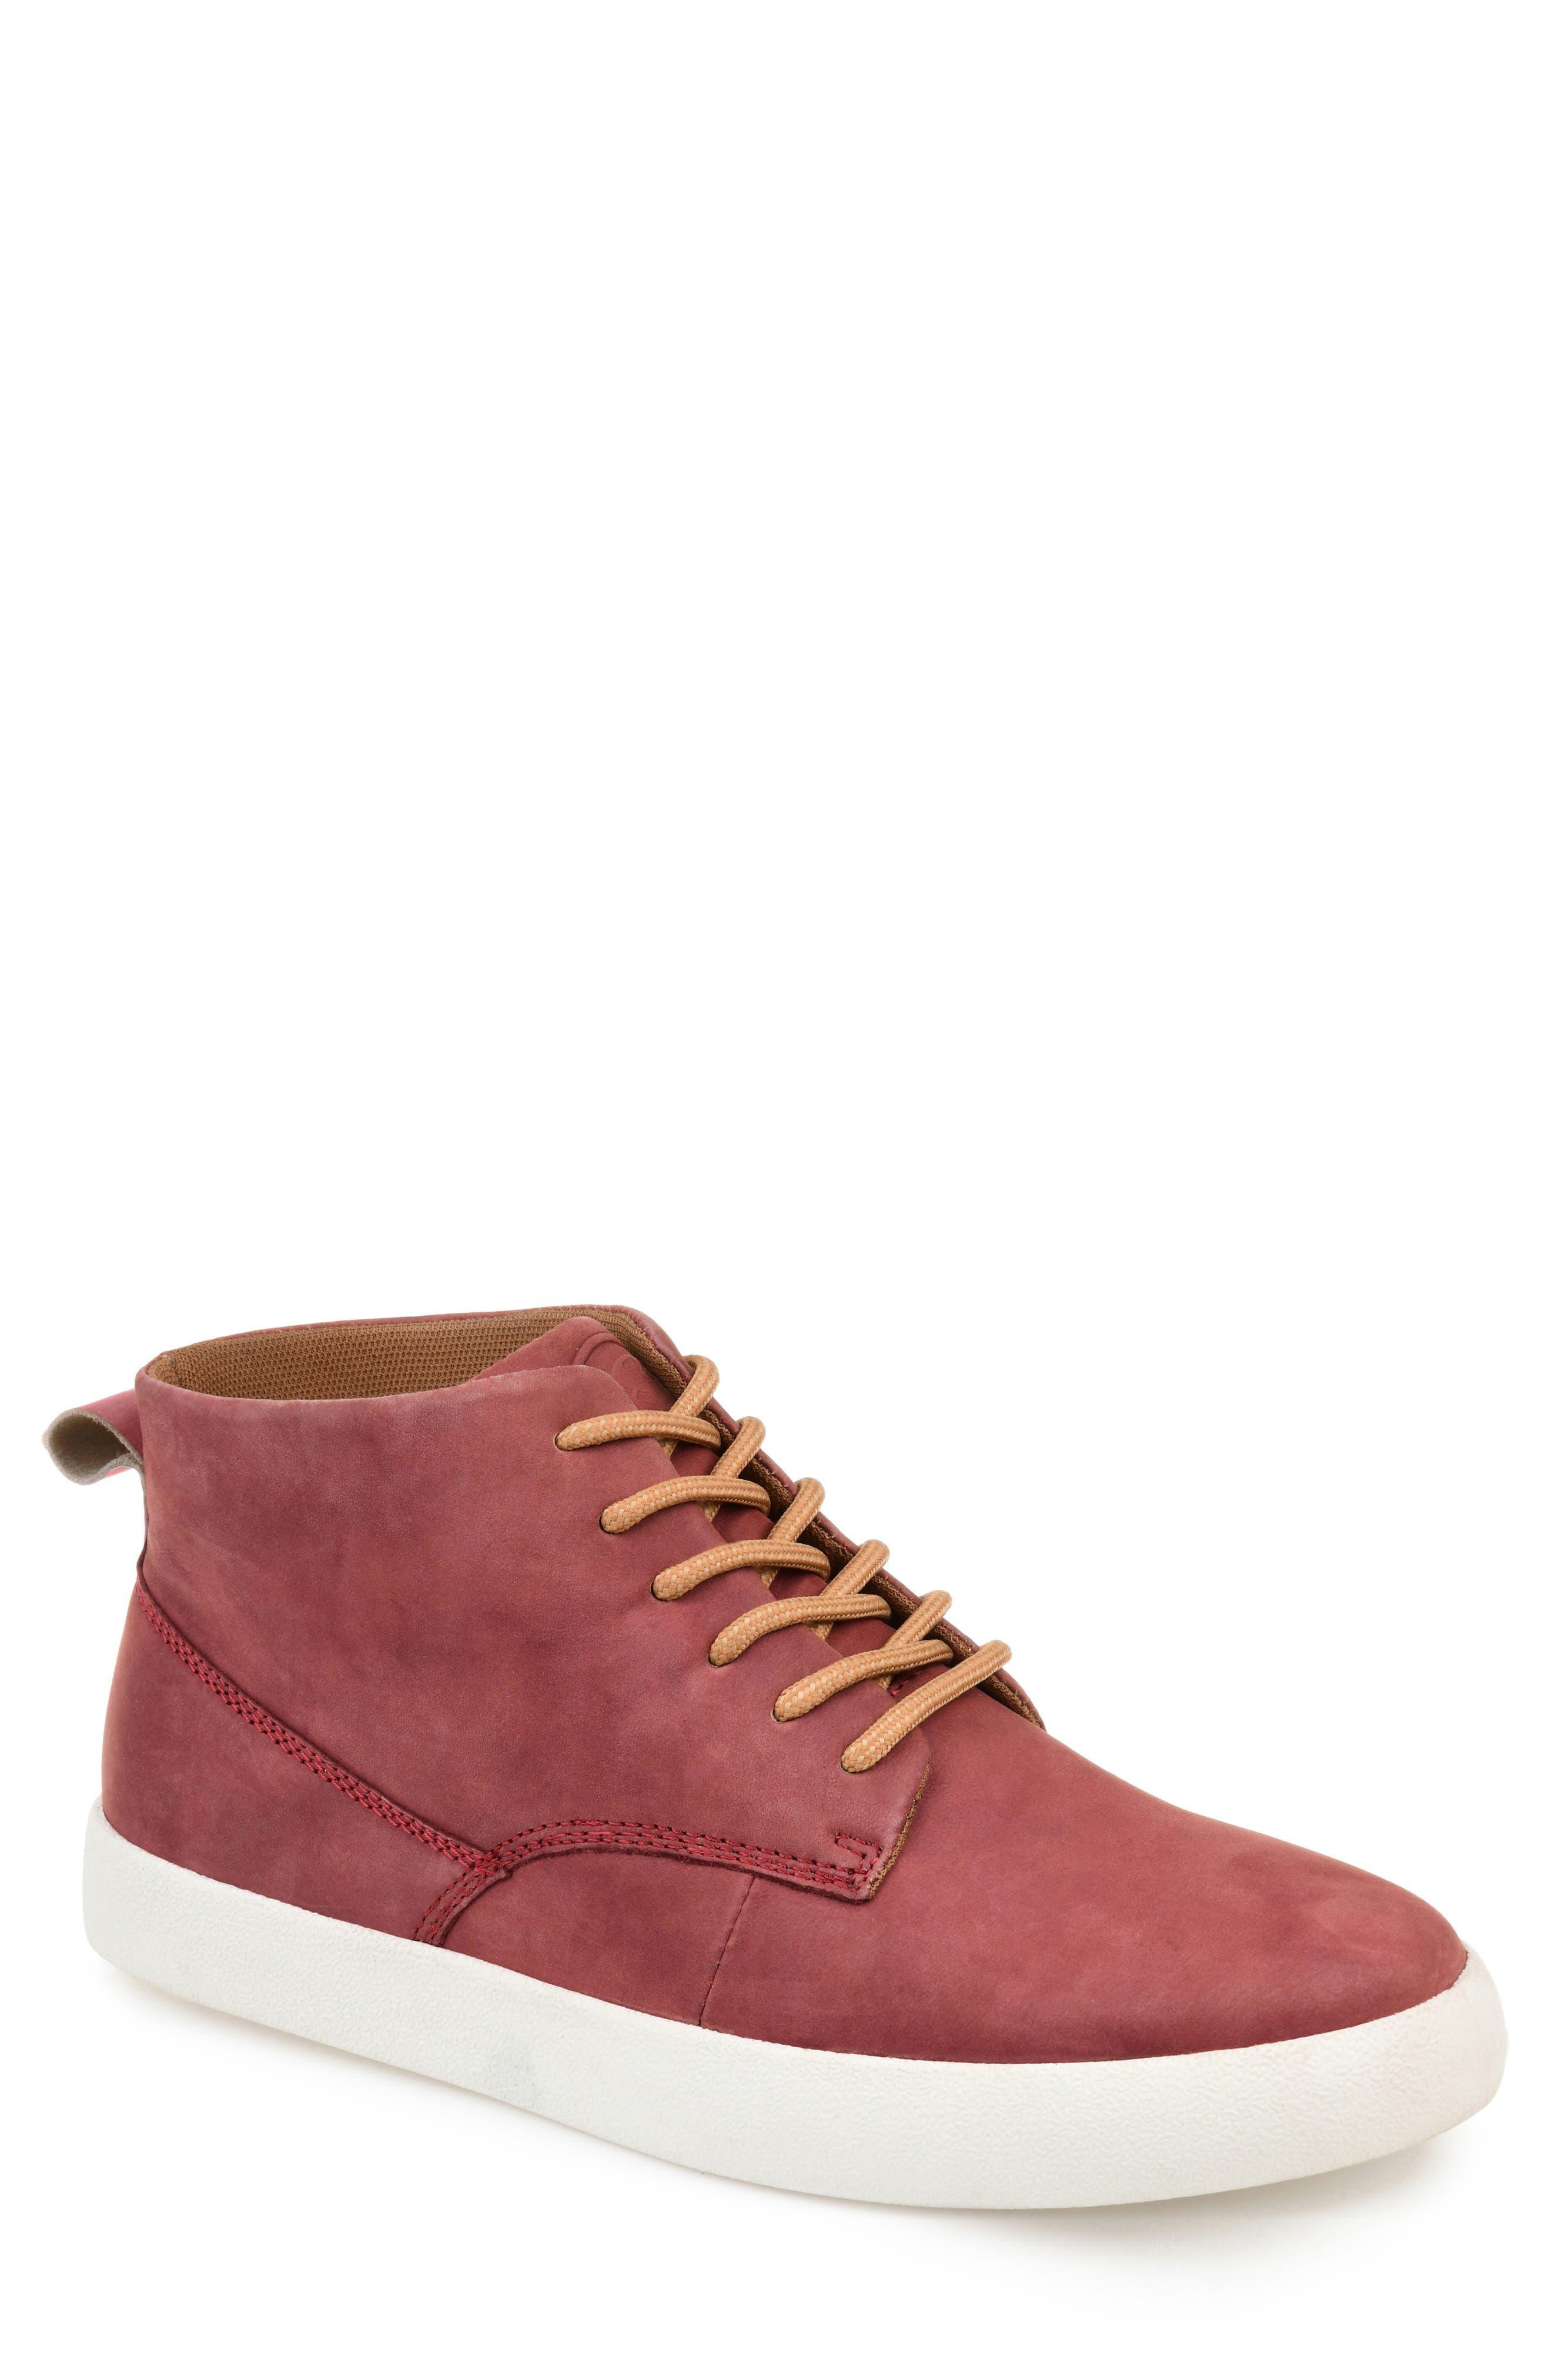 Thomas And Vine Damon Chukka Sneaker- Red